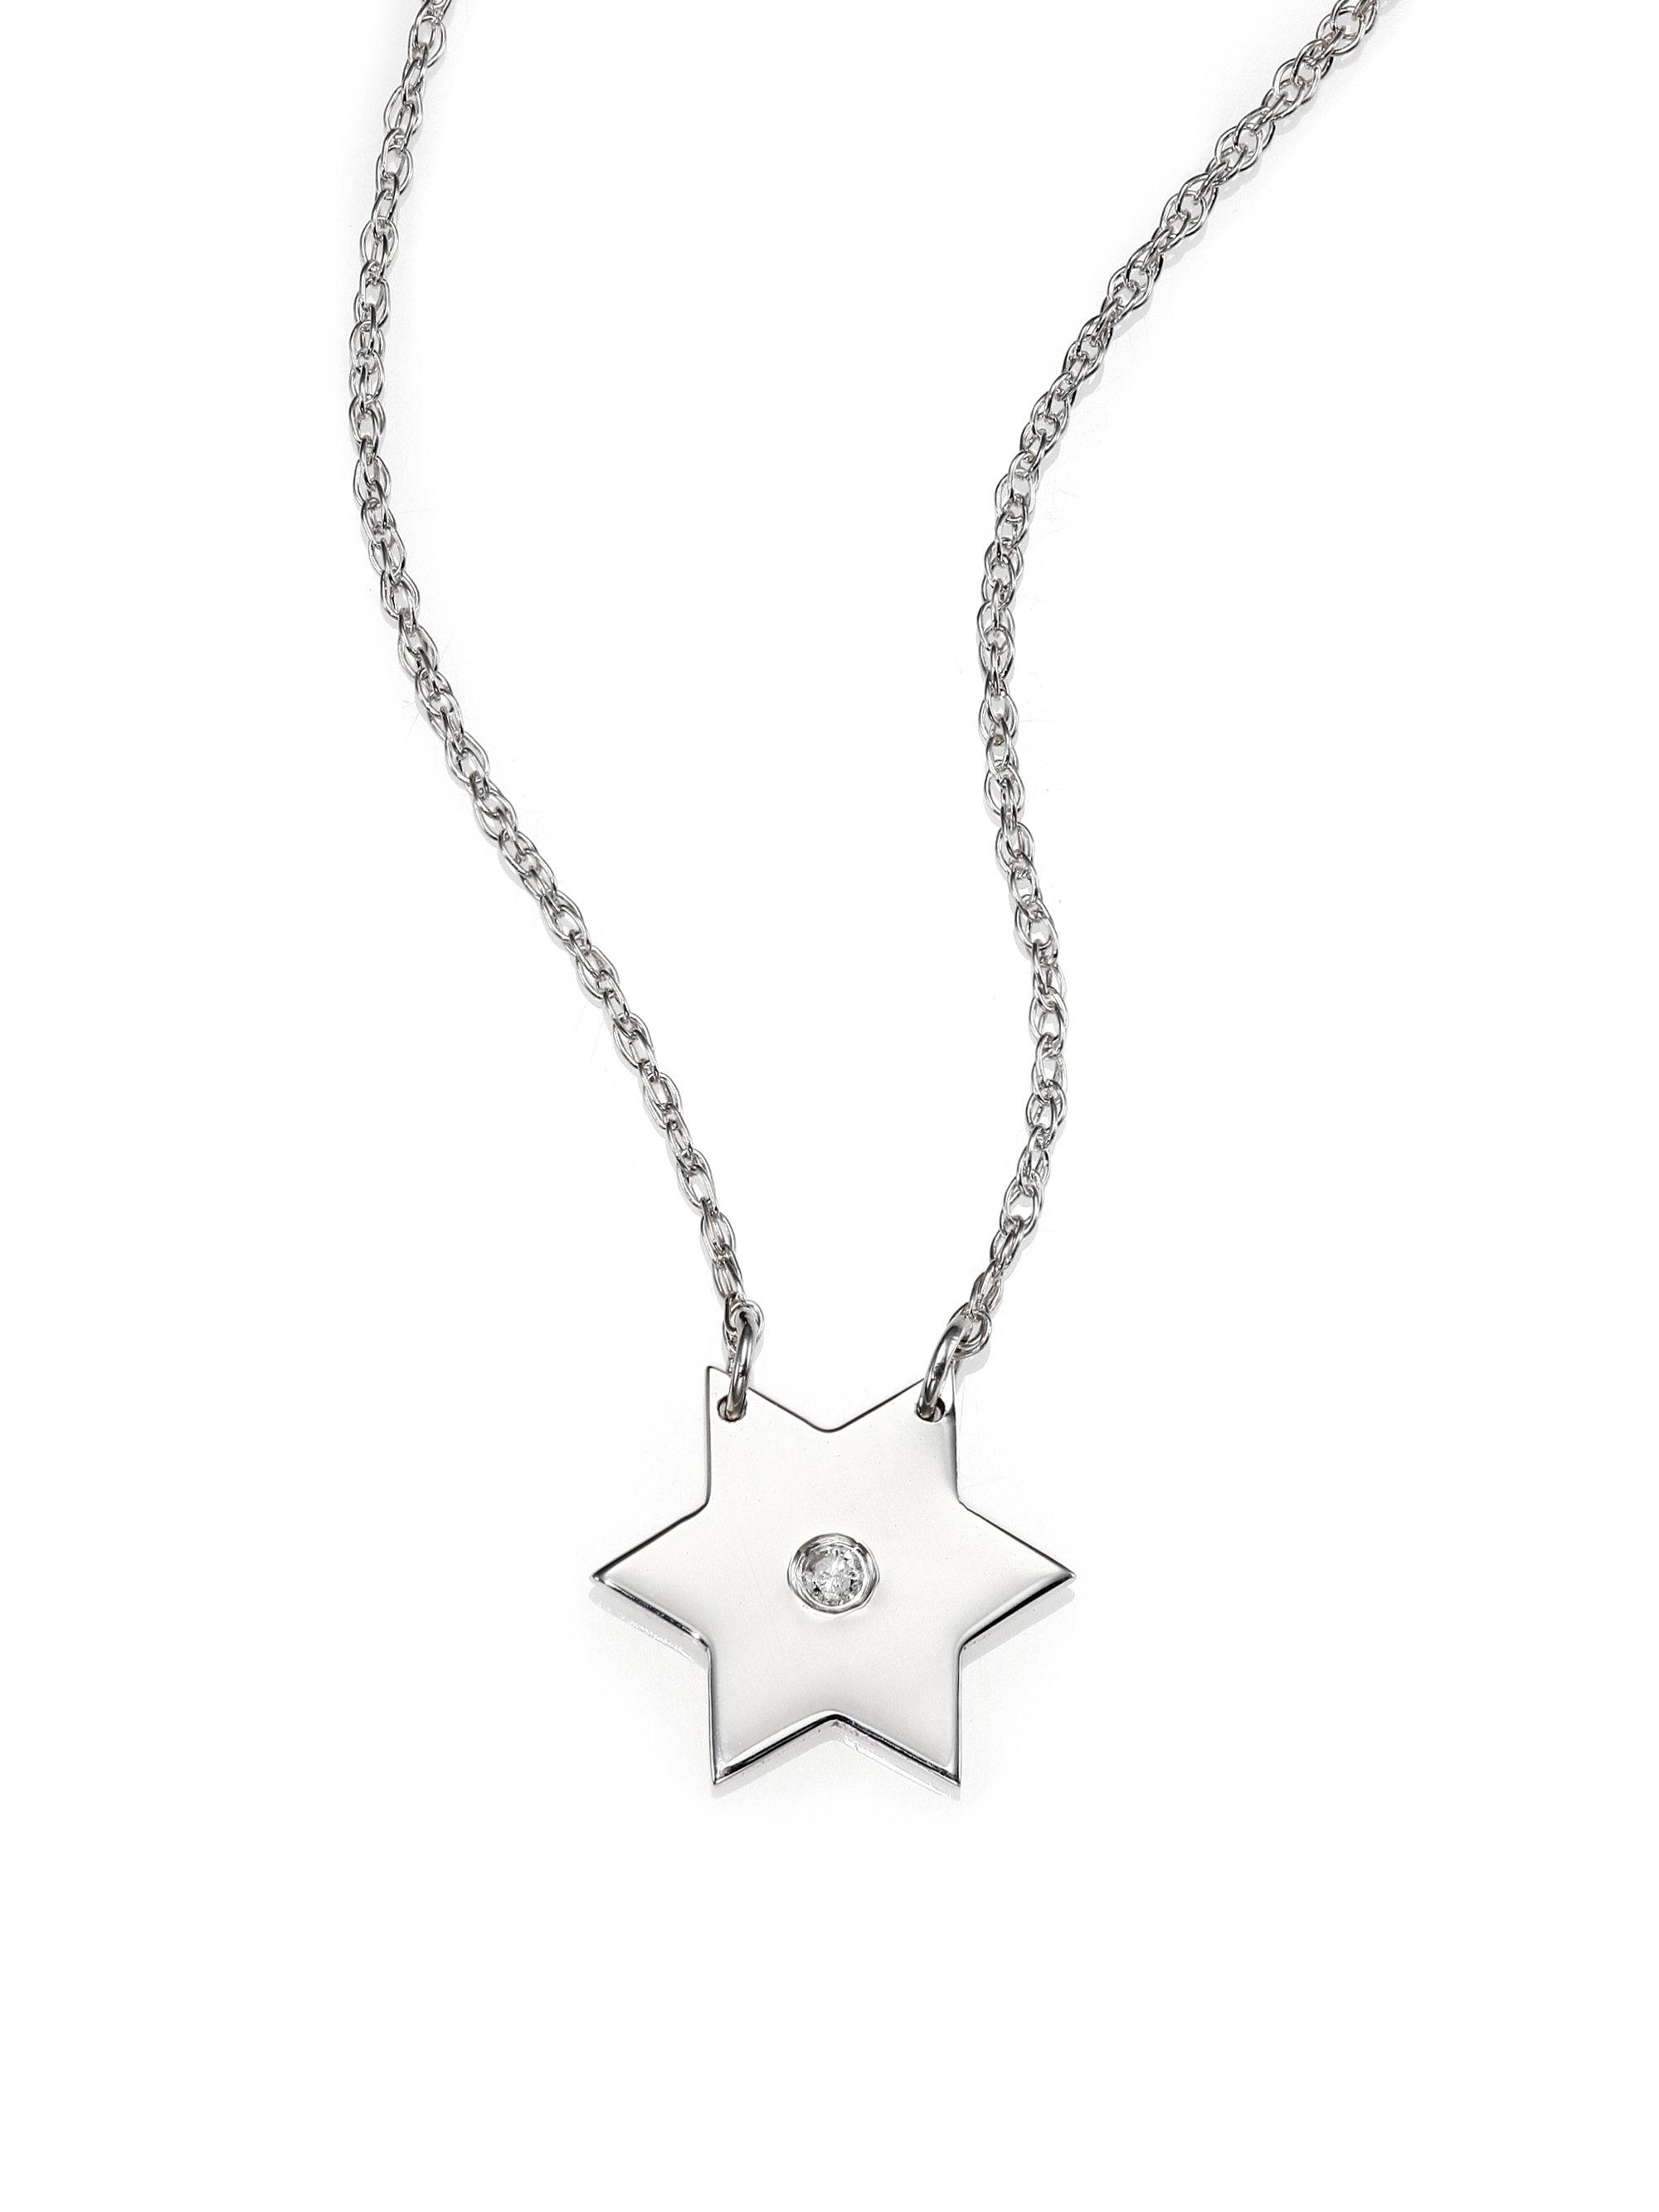 Elegant silver star pendant necklace jewellrys website jennifer zeuner stella diamond sterling silver star pendant aloadofball Image collections